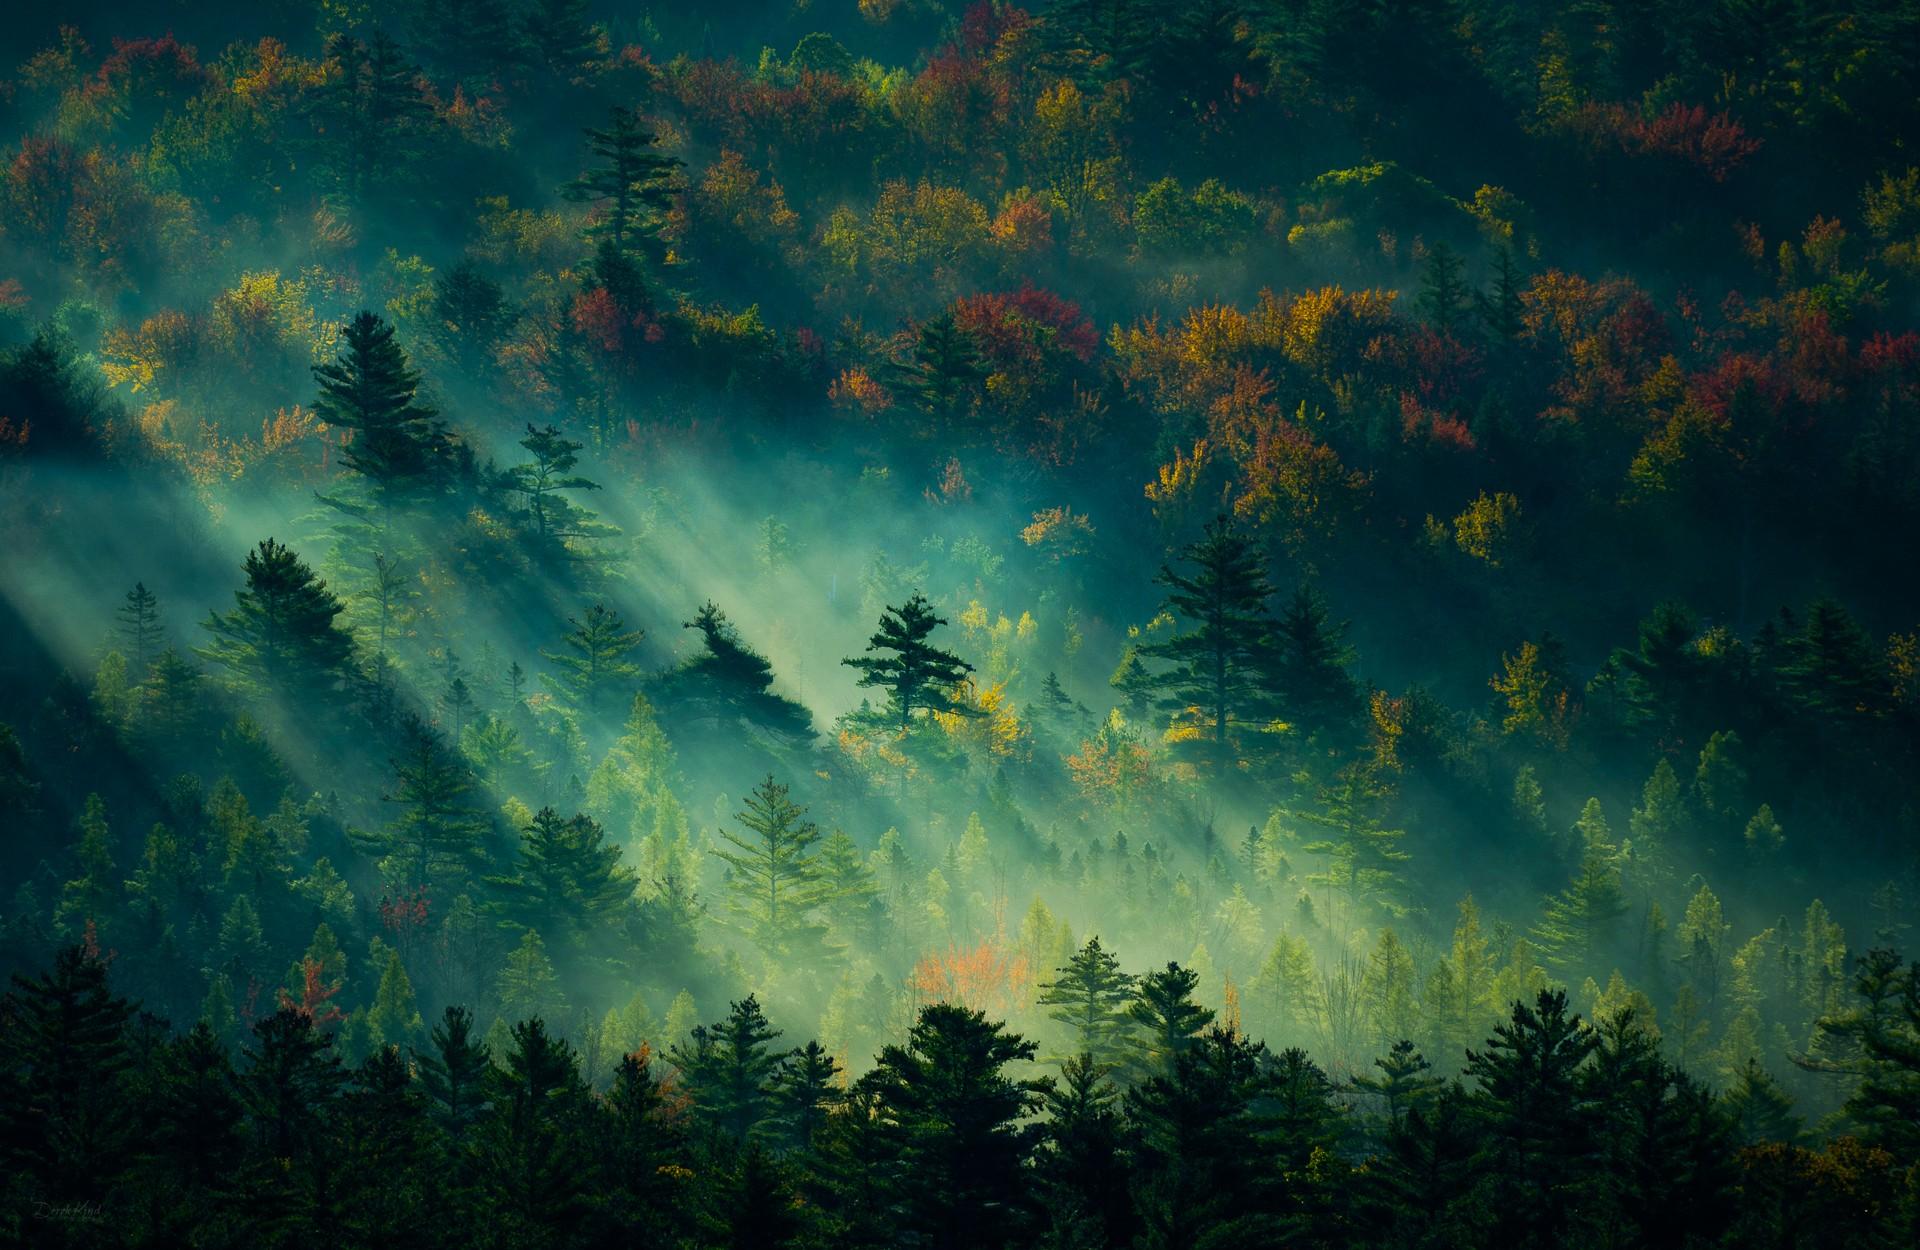 General 1920x1250 nature landscape forest mist England trees fall sunbeams dappled sunlight